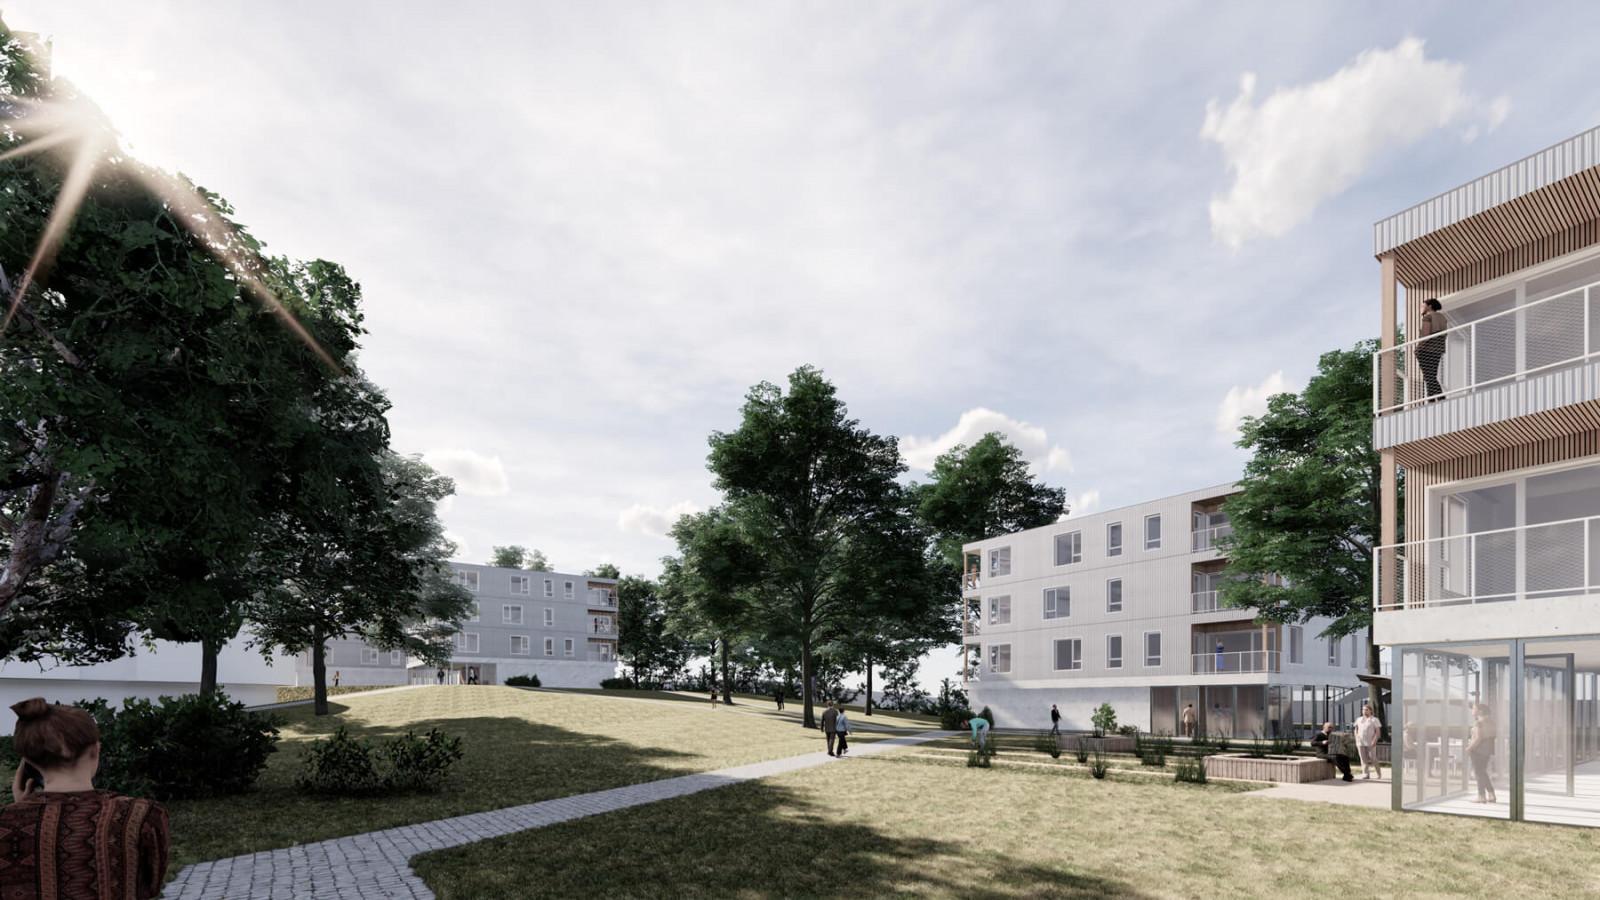 graam-sainte-barbe-01-residence-senior-forbach-exterieur-parc